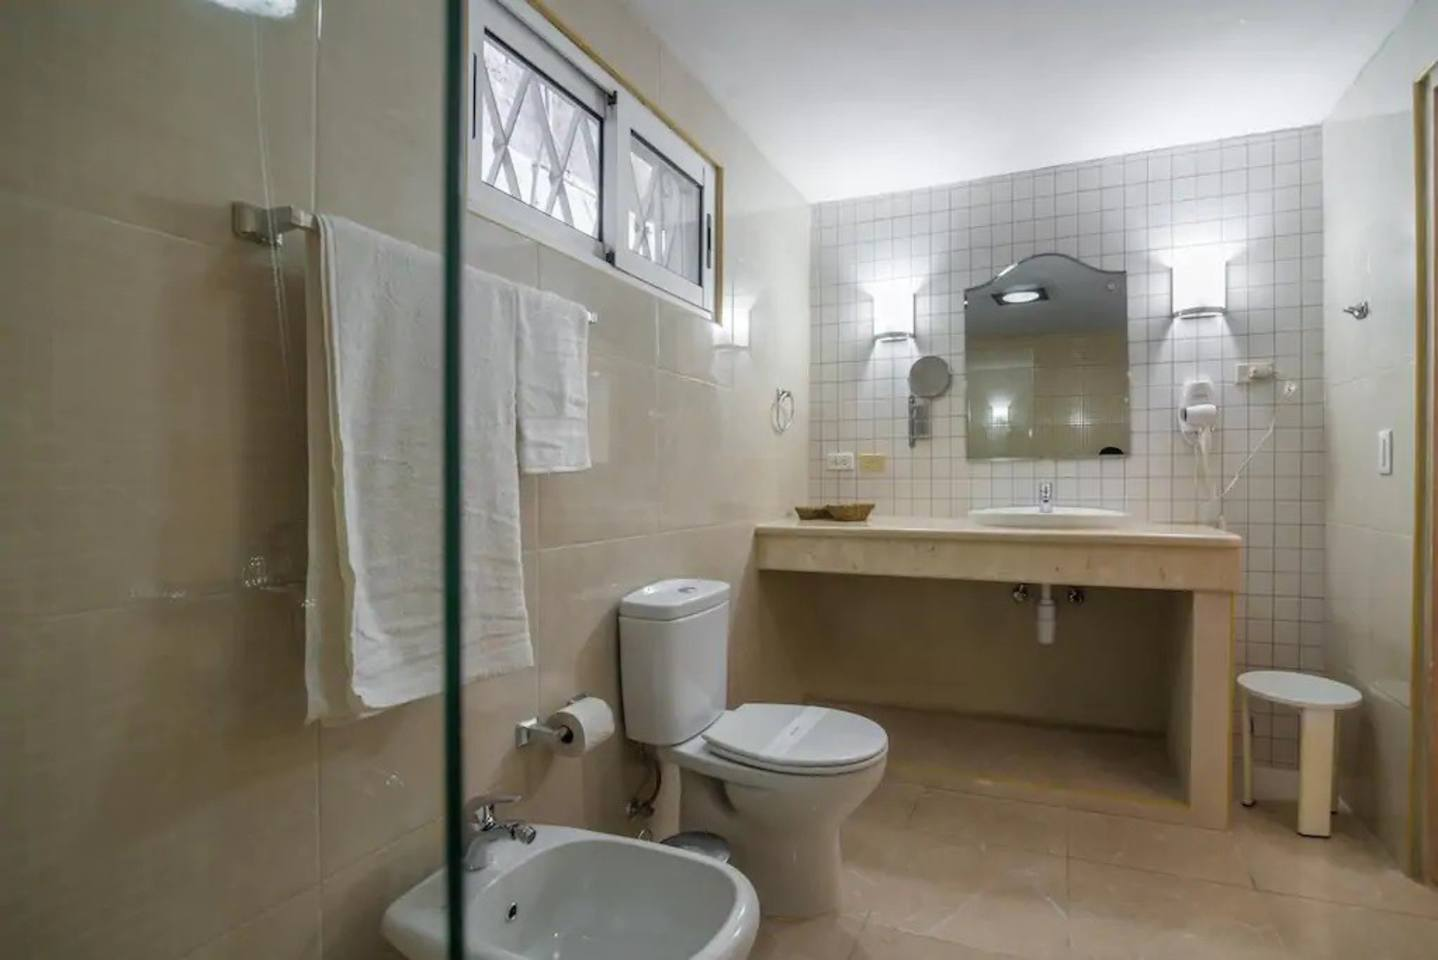 Villa Don Teto Suite & 8 Rooms: Great Havana View photo 5730902